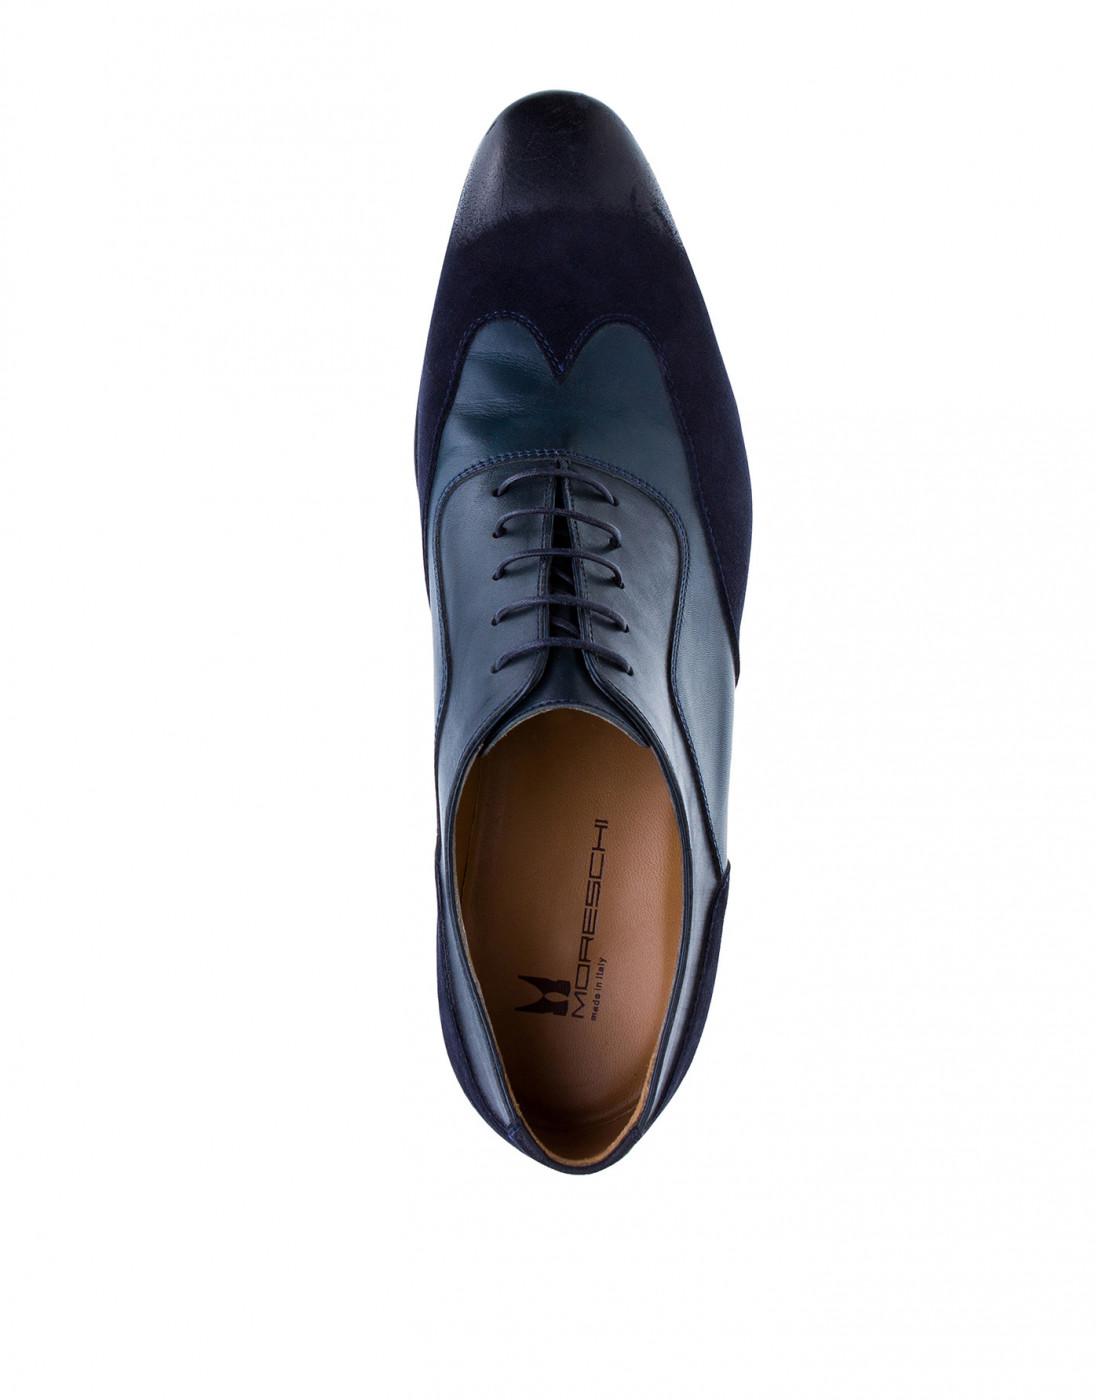 Туфли синие мужские Moreschi S42619 BLUE-5